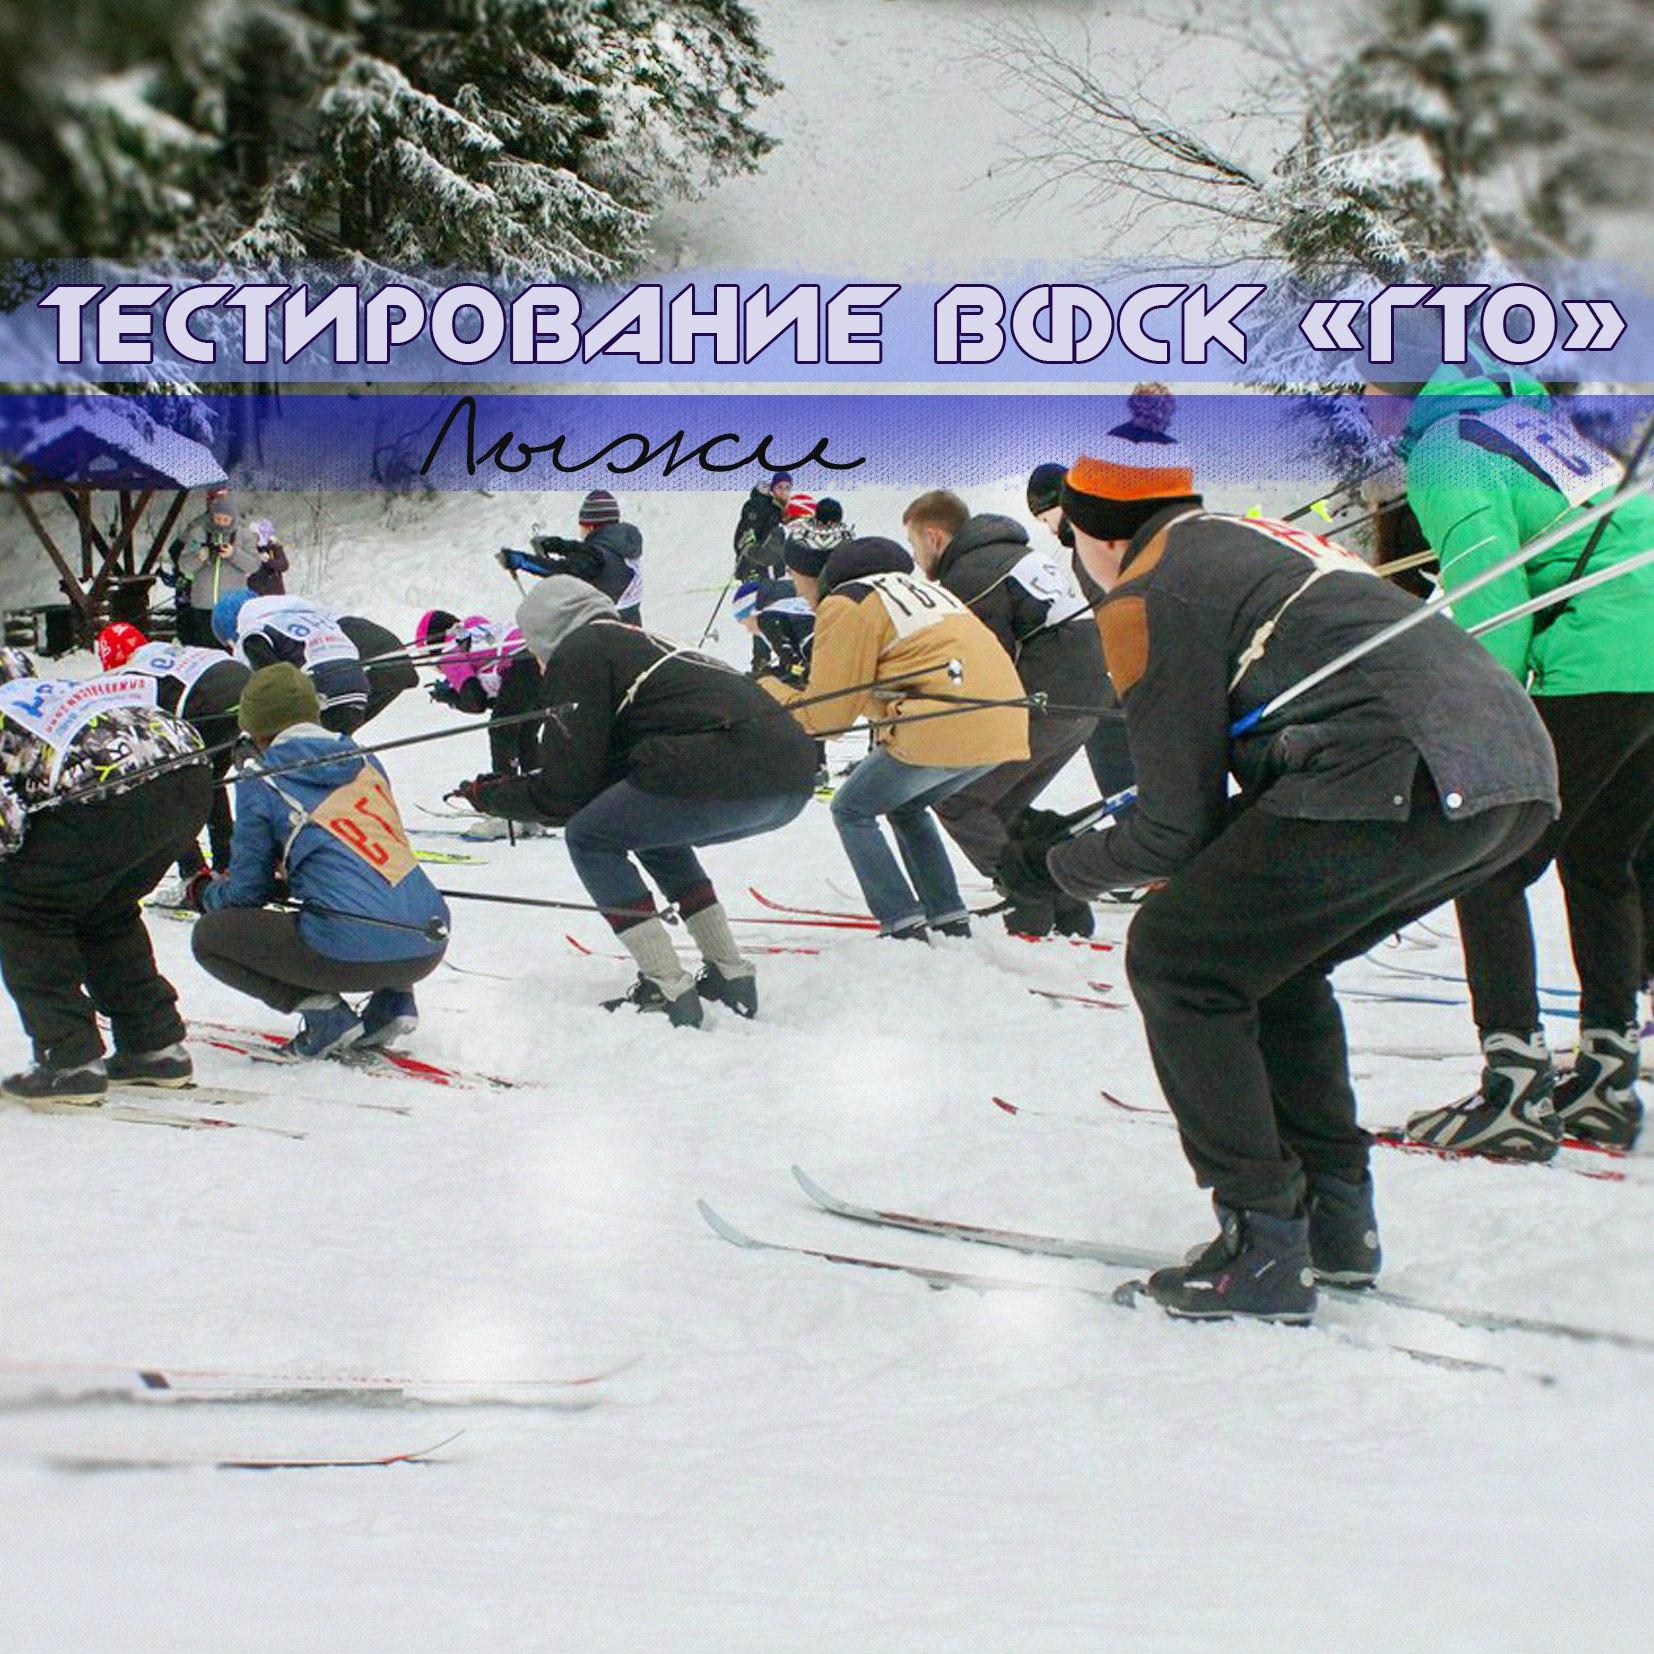 ТЕСТИРОВАНИЕ ВФСК ГТО Лыжи